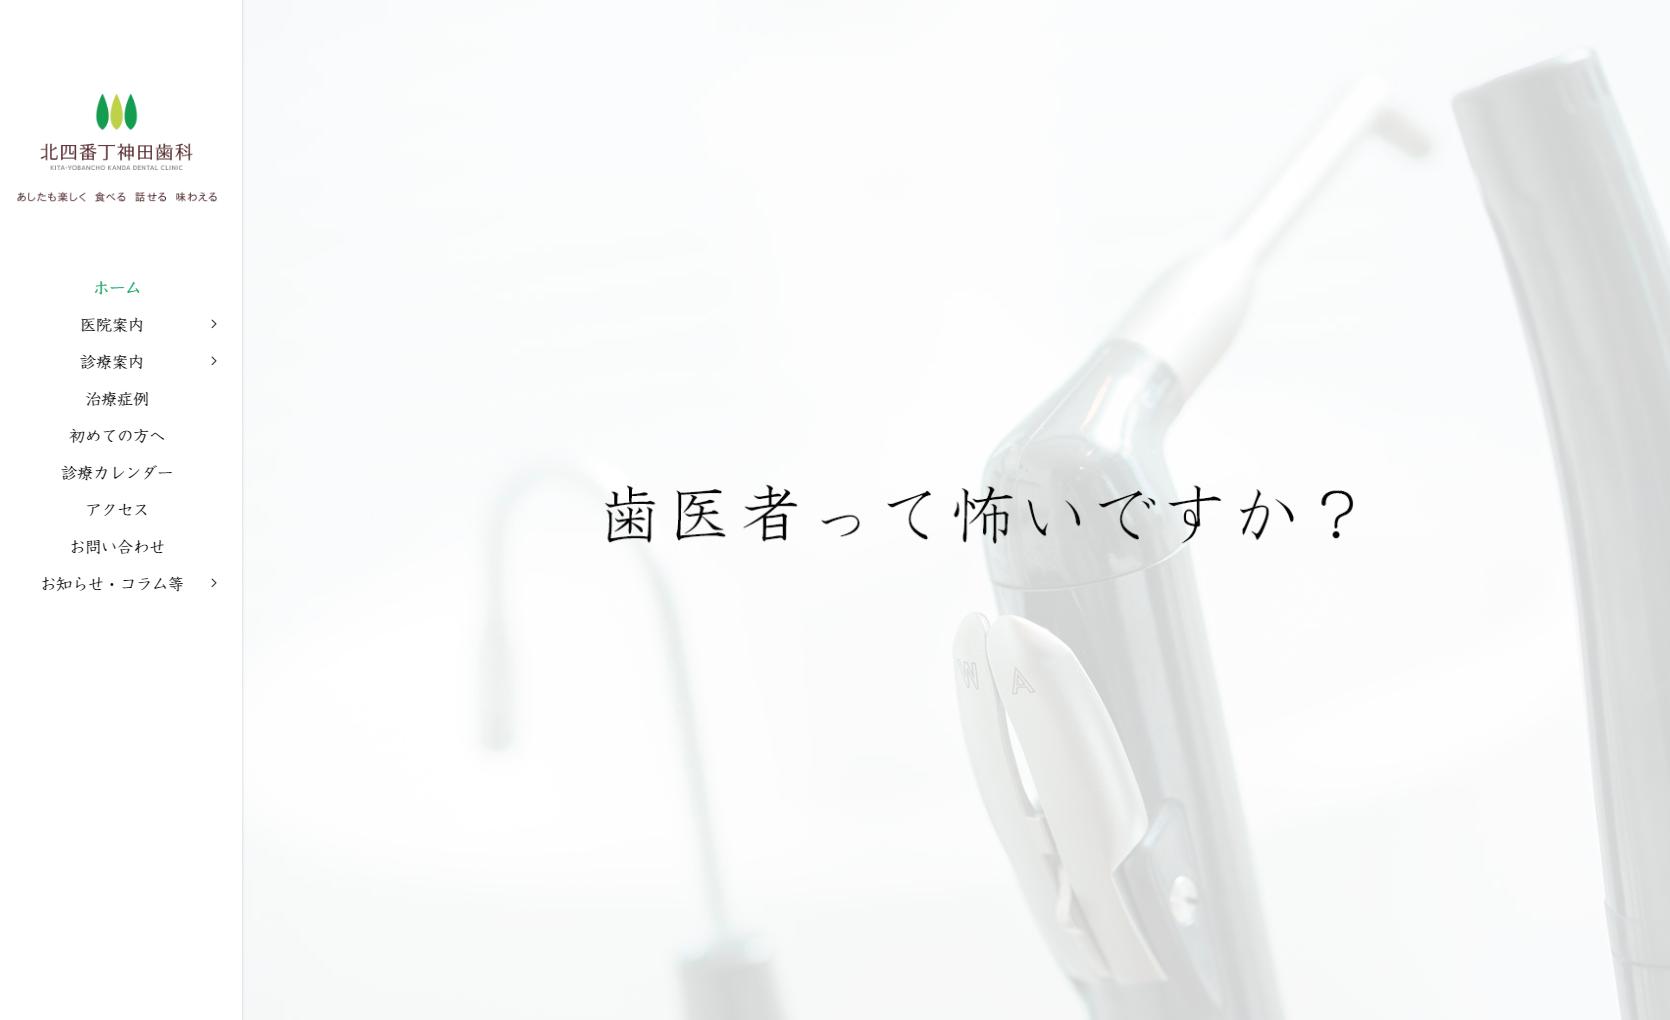 SnapCrab_NoName_2018-3-14_16-27-14_No-00